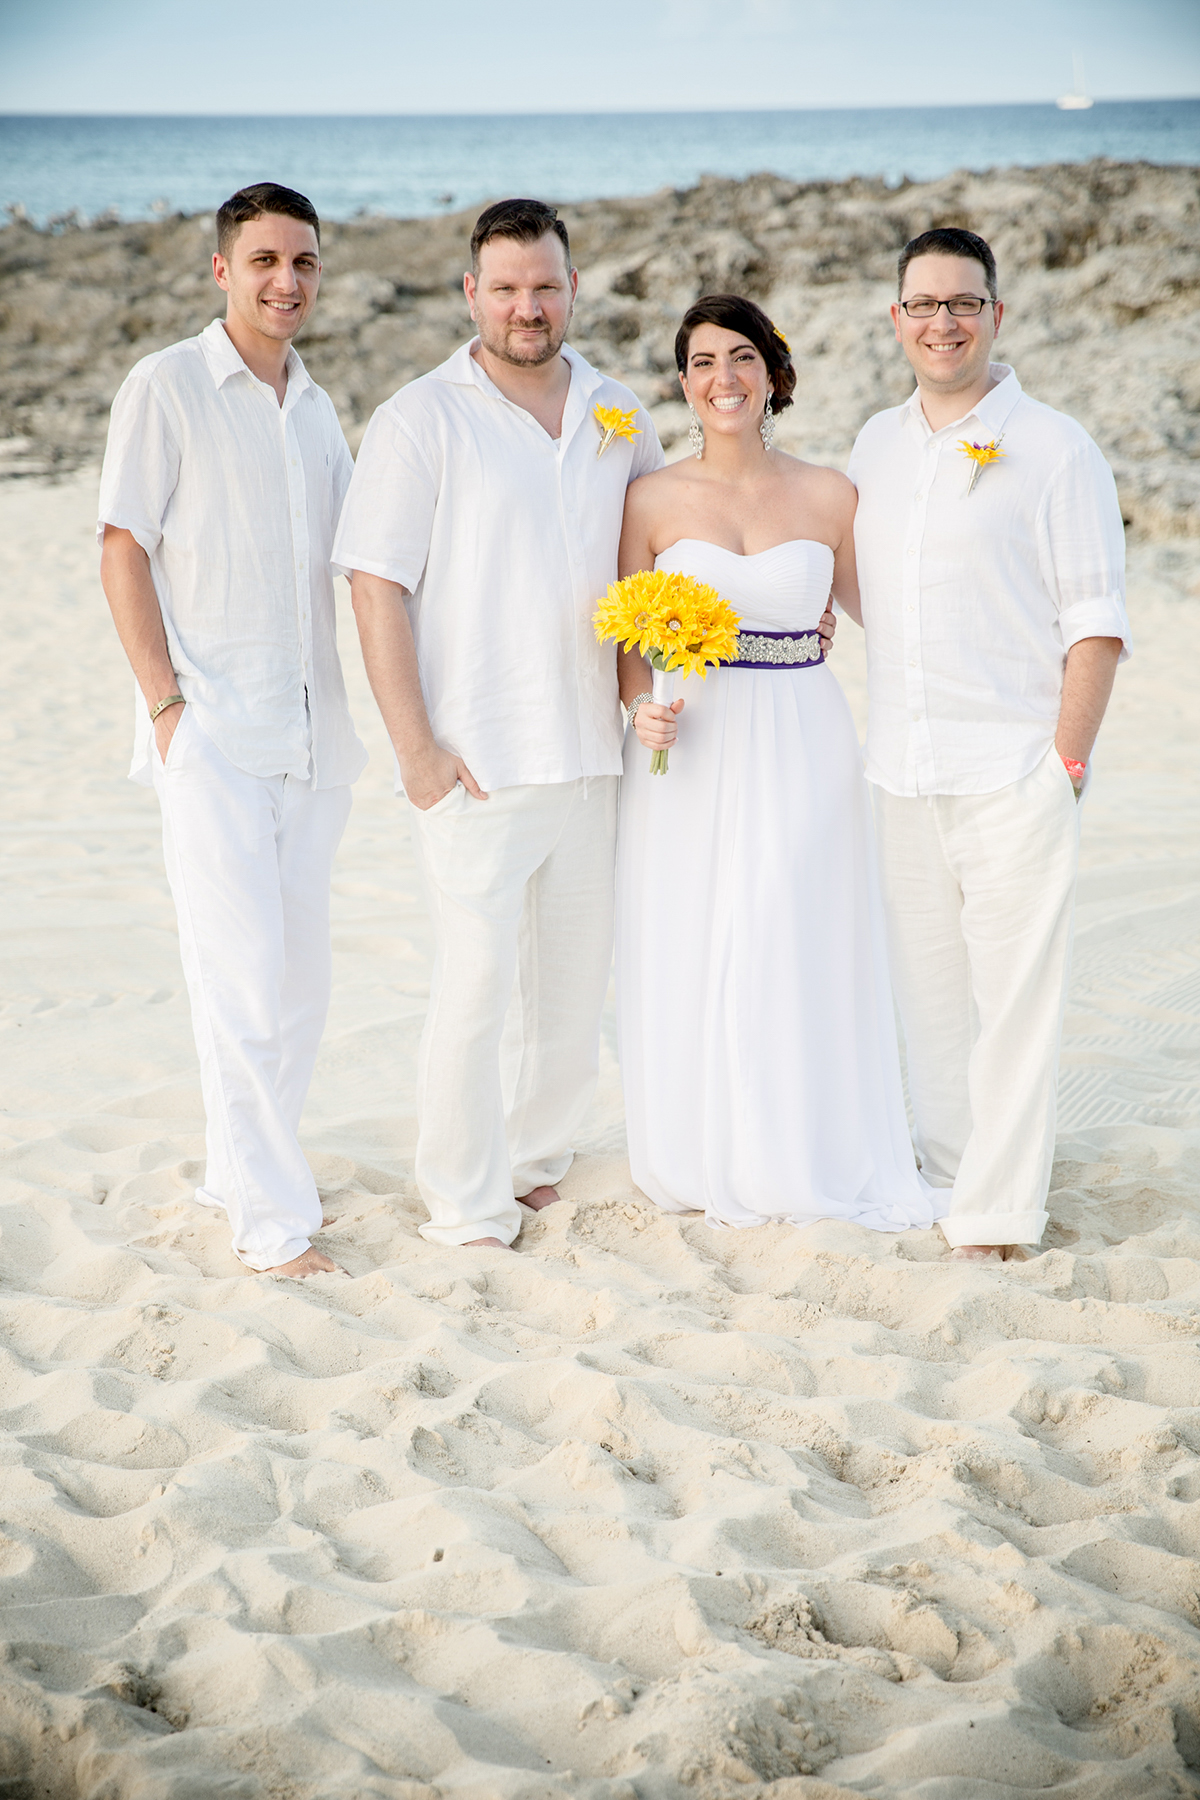 Daniela-Edvard_wedding_Dukat-Photos-1359.jpg